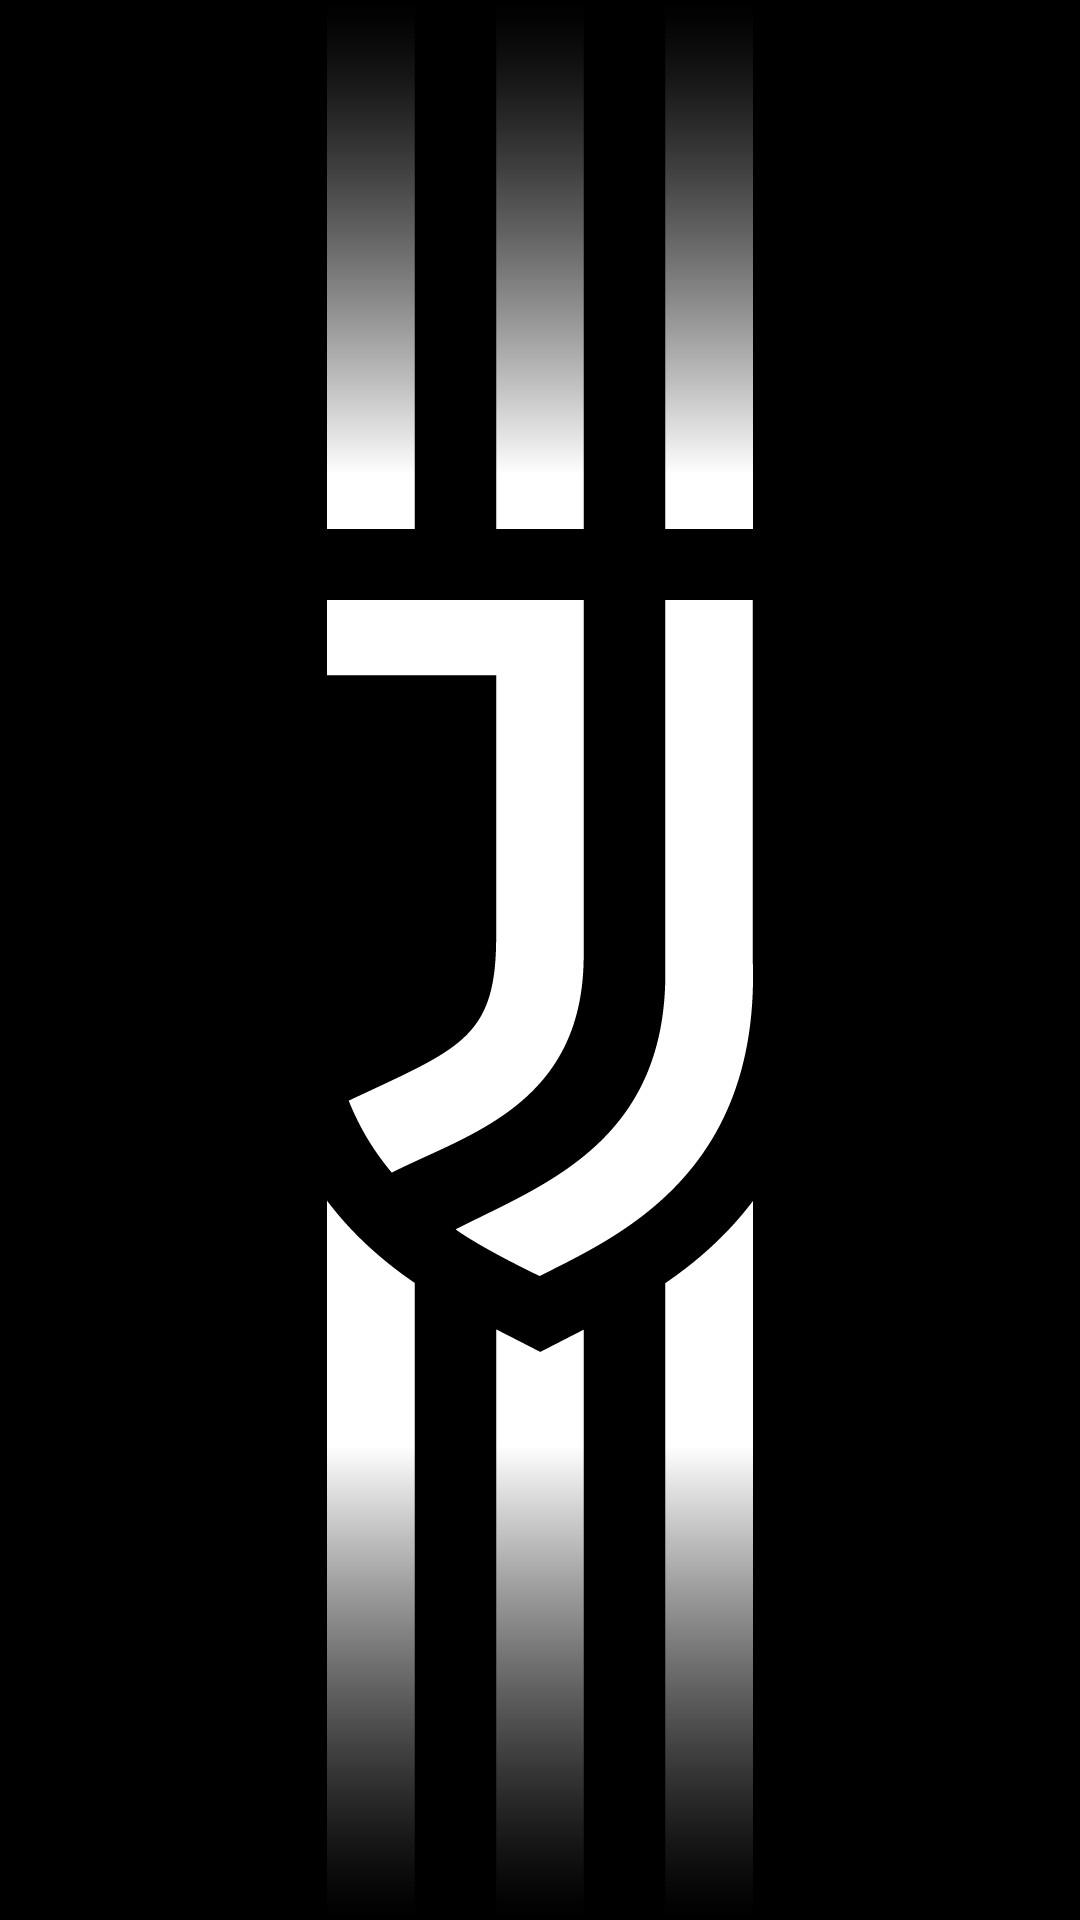 2017 New Logo Juventus Wallpaper For Iphone